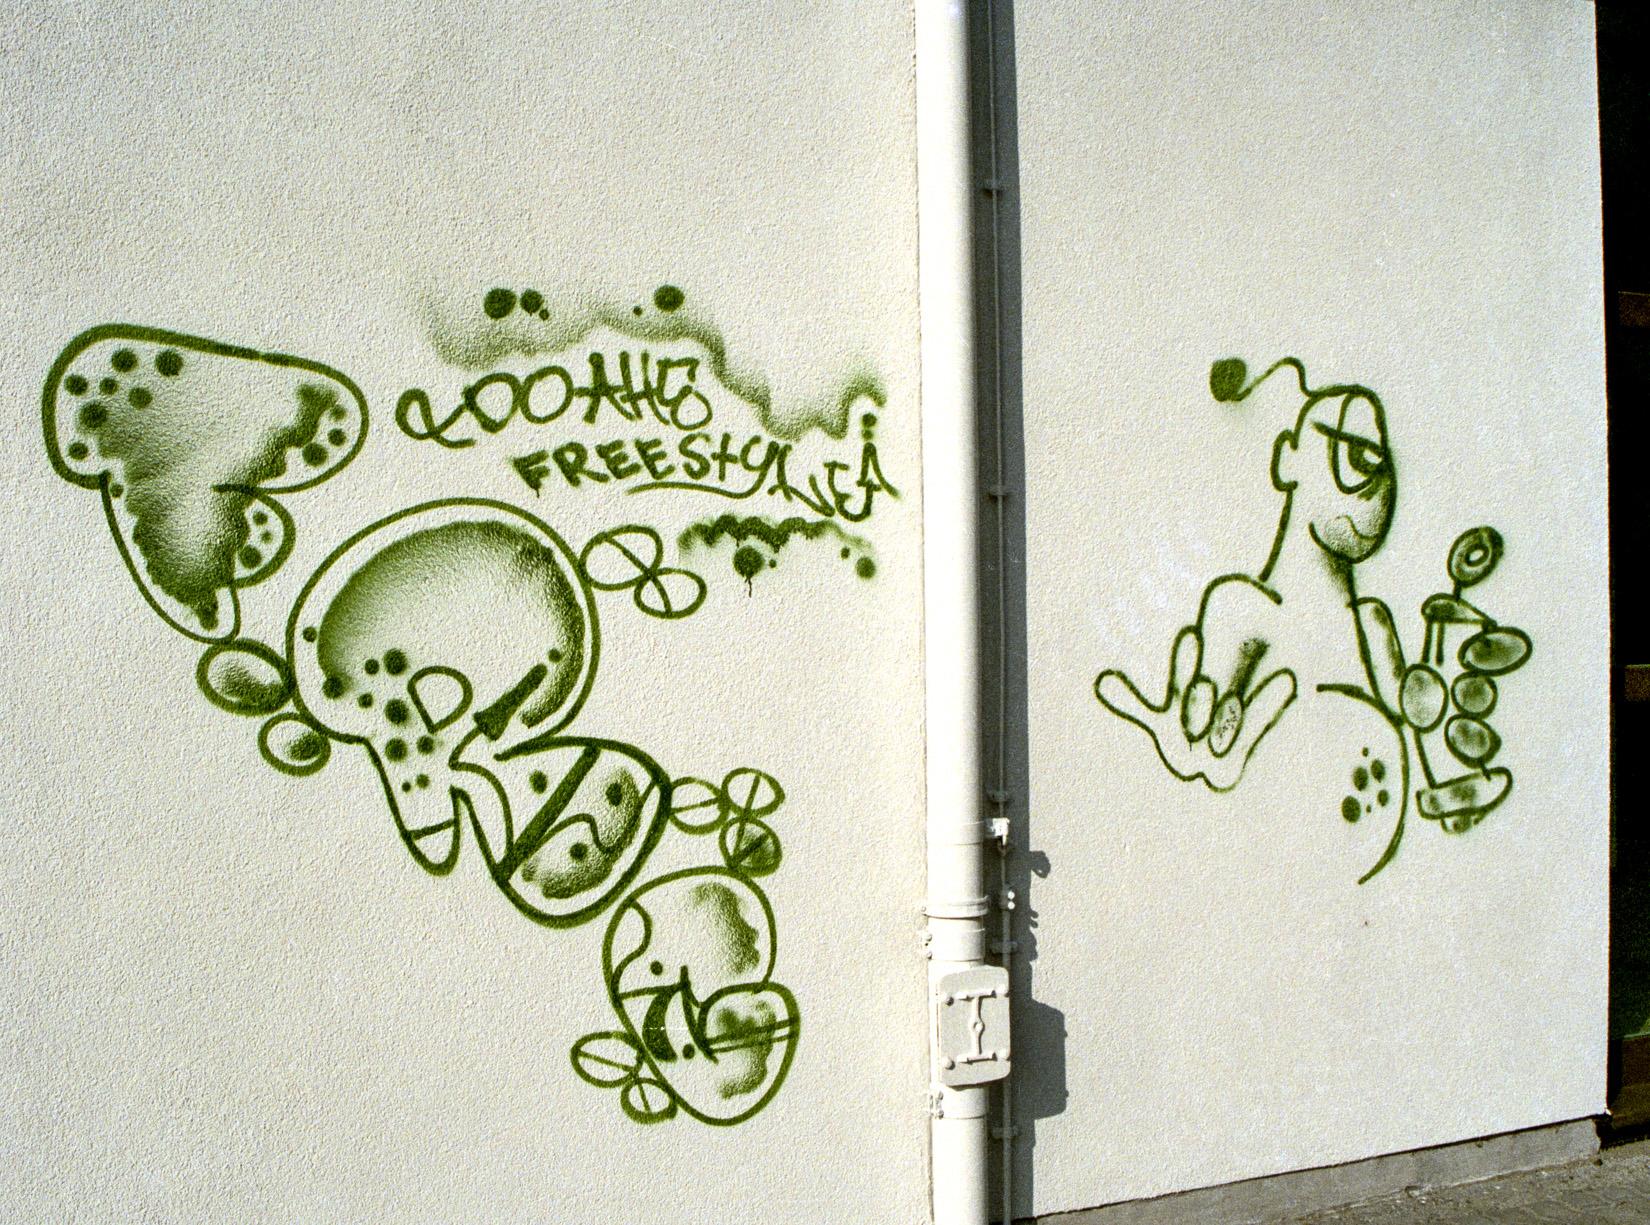 Frankfurt_Graffiti_1988_1989_H88_FRC (9 von 25)